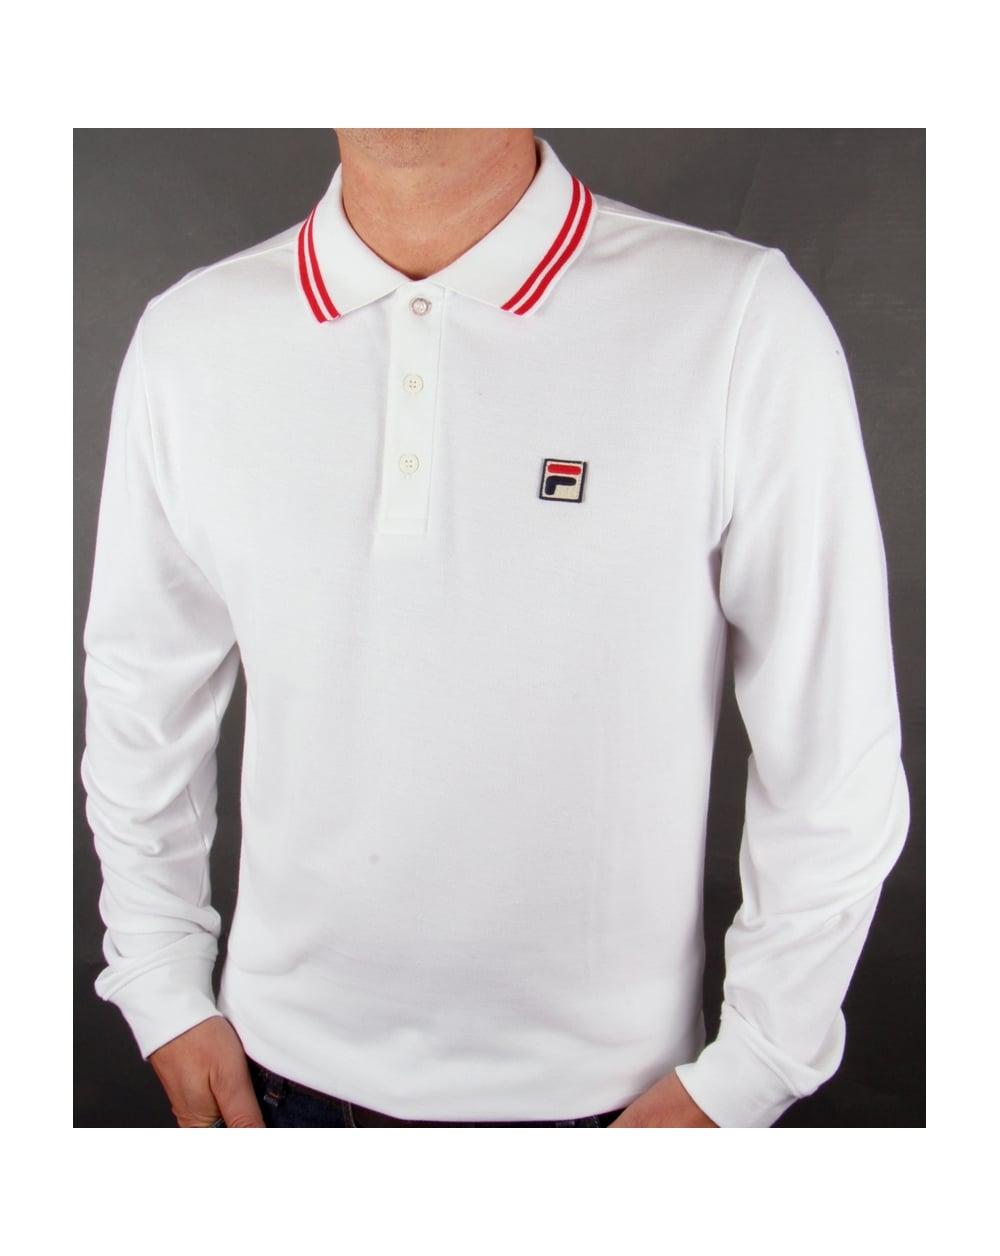 Fila Vintage Ace Long Sleeve Polo Shirt White